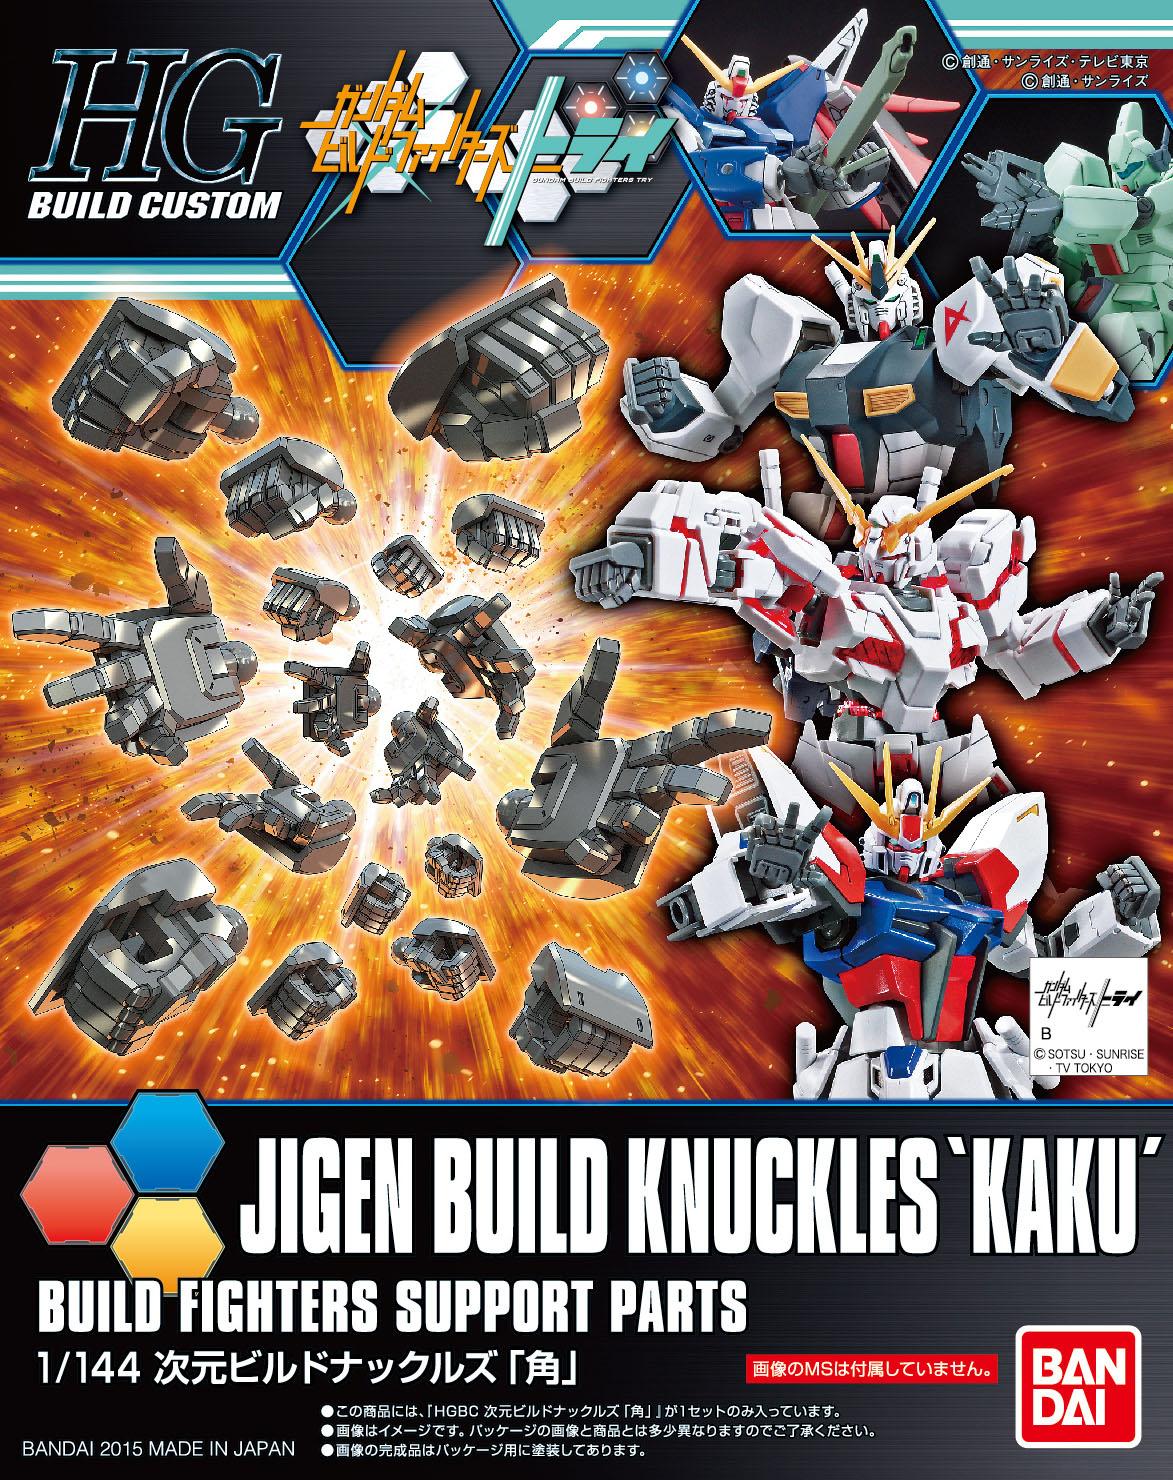 HGBC 1/144 次元ビルドナックルズ「角」 [Jigen Build Knuckles 'Kaku']